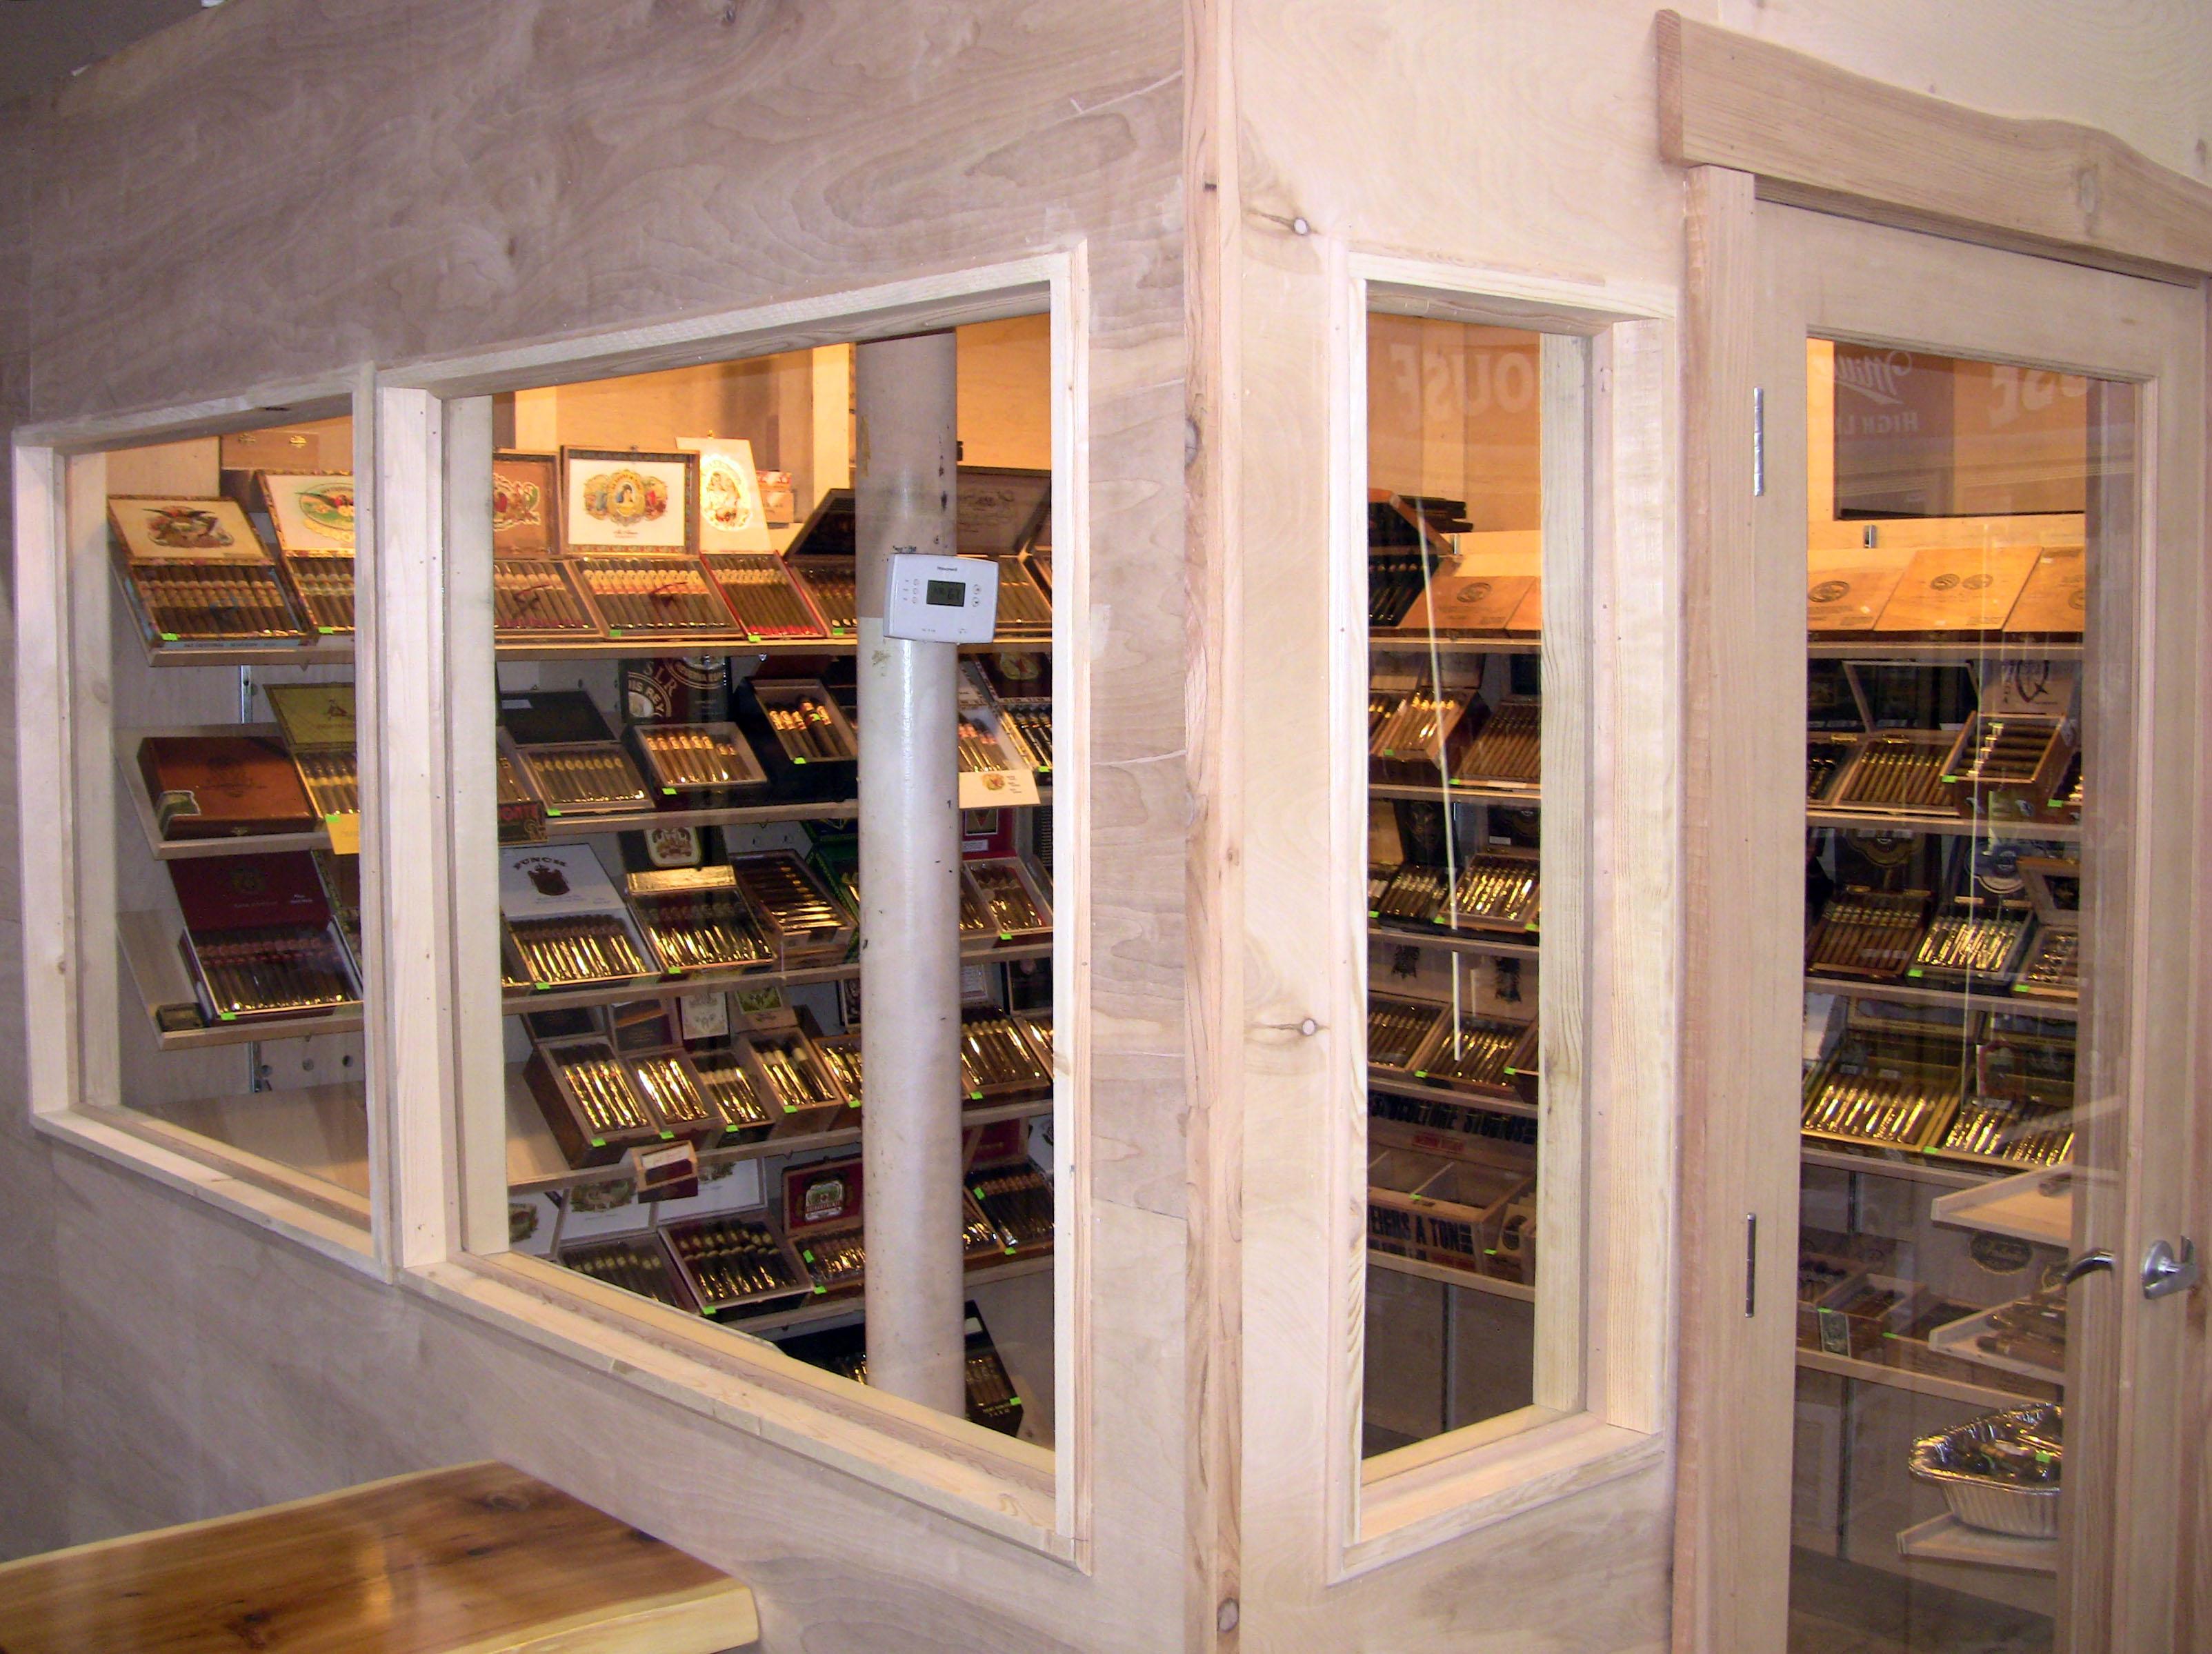 Stogies N Hops Set To Rock Lynnwood  Craft Beer Monger. Boston Granite Exchange. Storage Cupboards. Kitchen Layouts. Blown Glass Chandelier. Closets. Desk On Wheels. Parkview Homes. Balcony Design